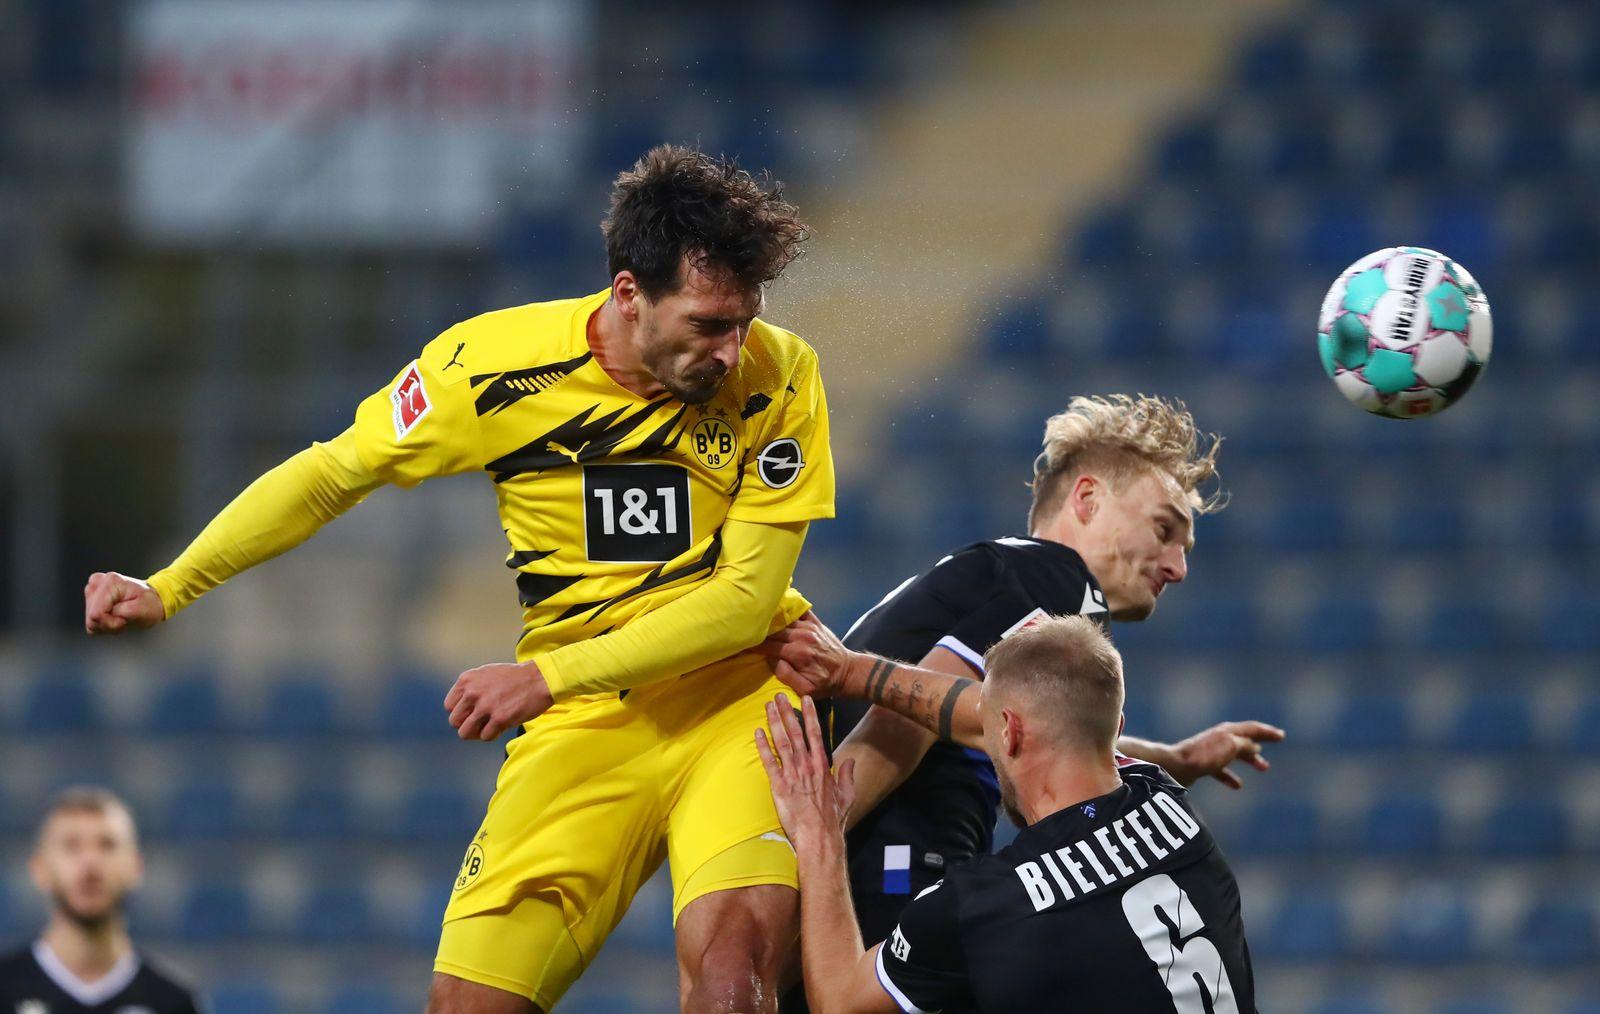 DSC Arminia Bielefeld v Borussia Dortmund, Germany - 31 Oct 2020